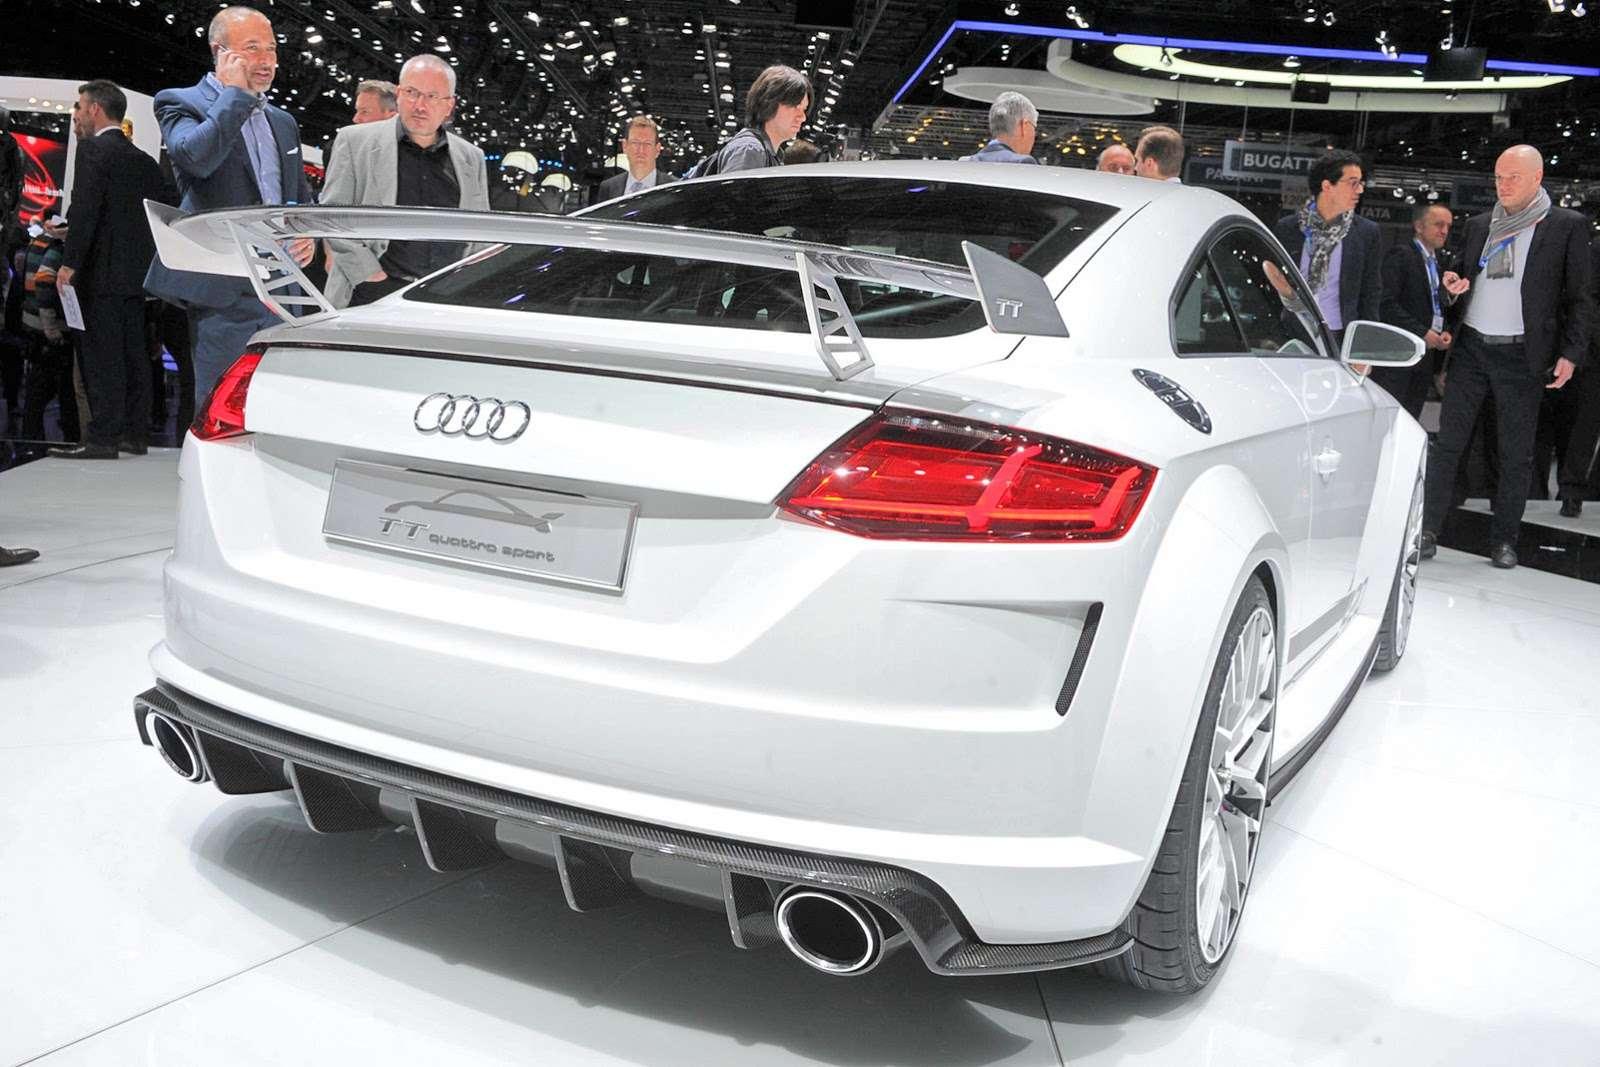 Audi tt Geneva 2014